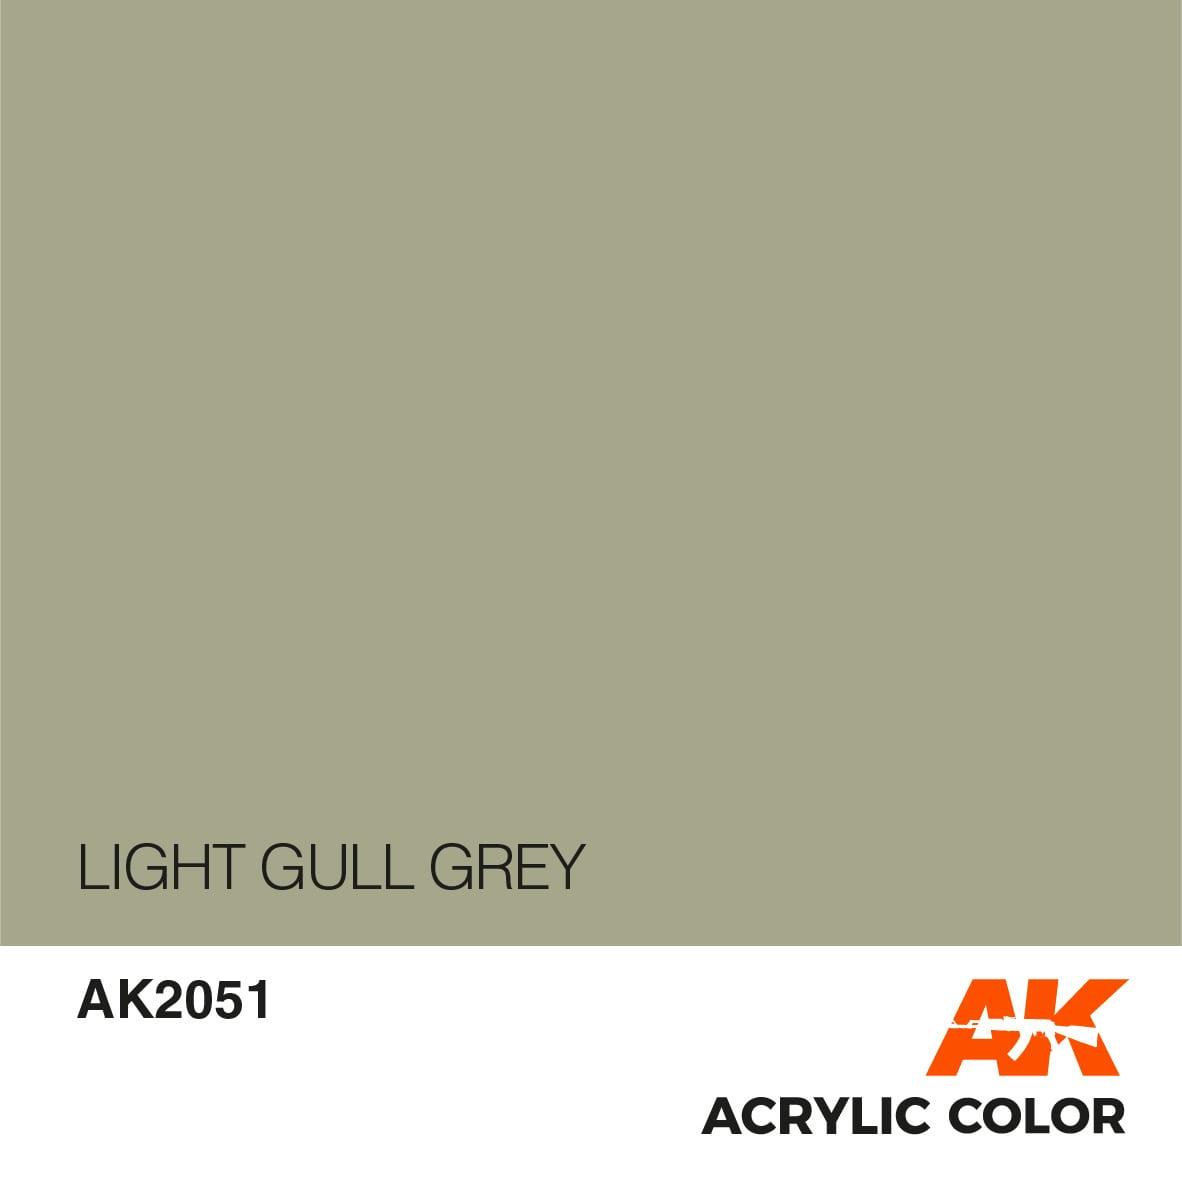 FS 16440 LIGHT GULL GRAY